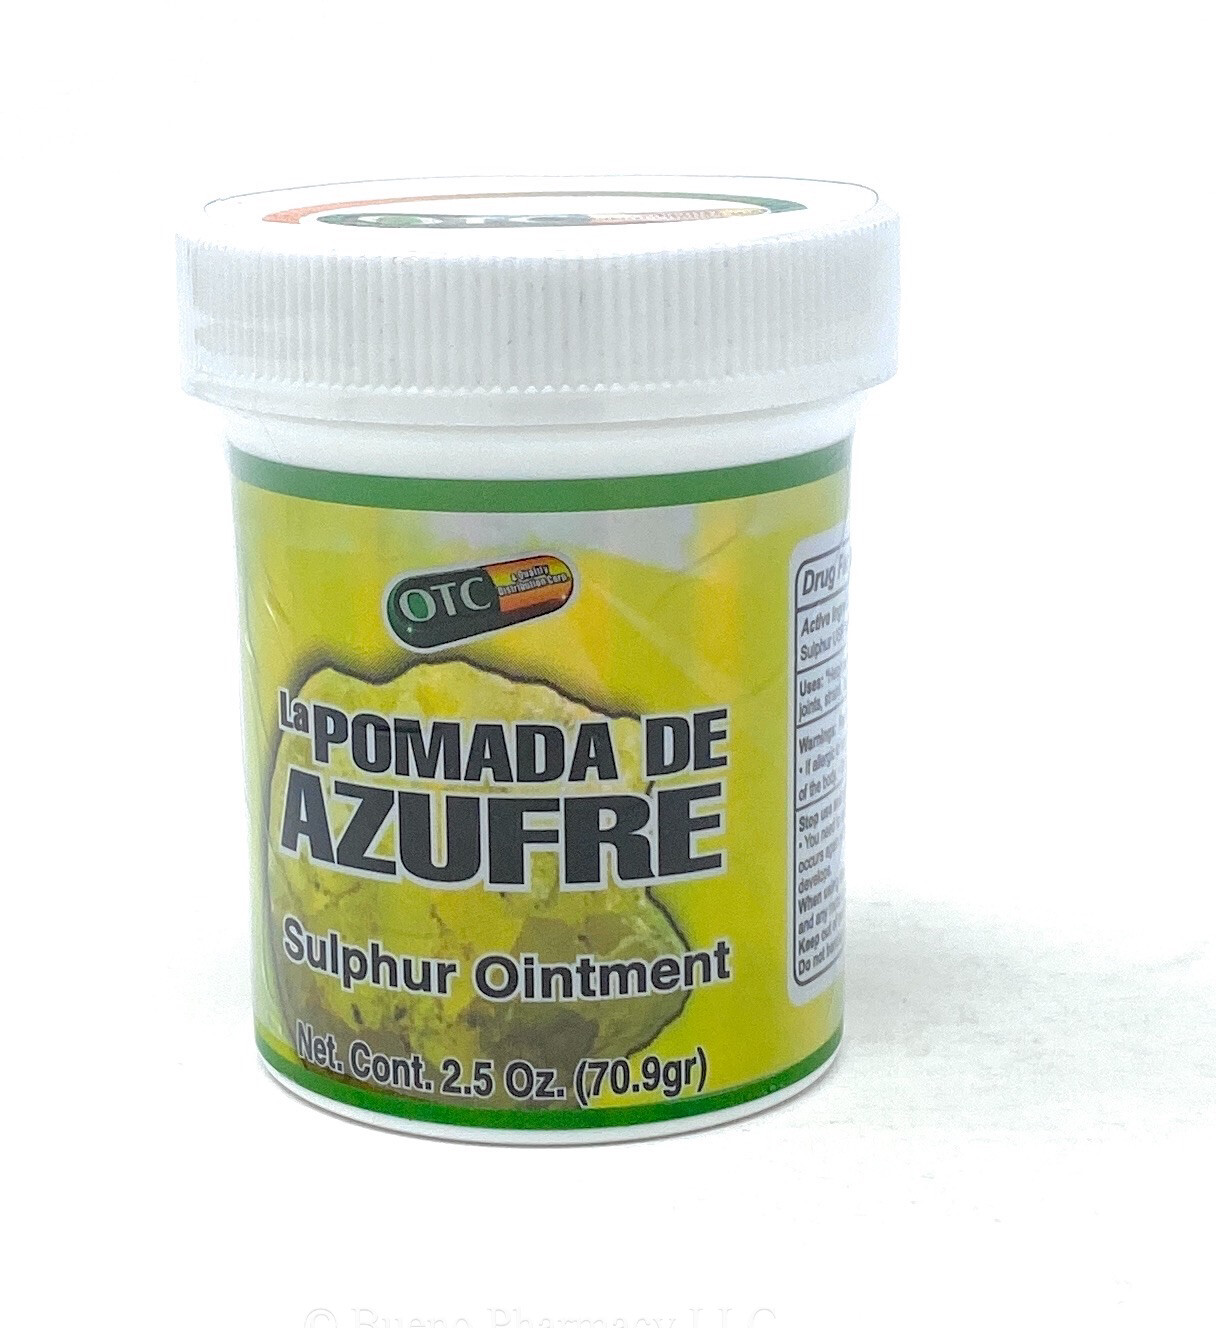 Pomada De Azufre /sulphur Ointments 2.5oz( Green)